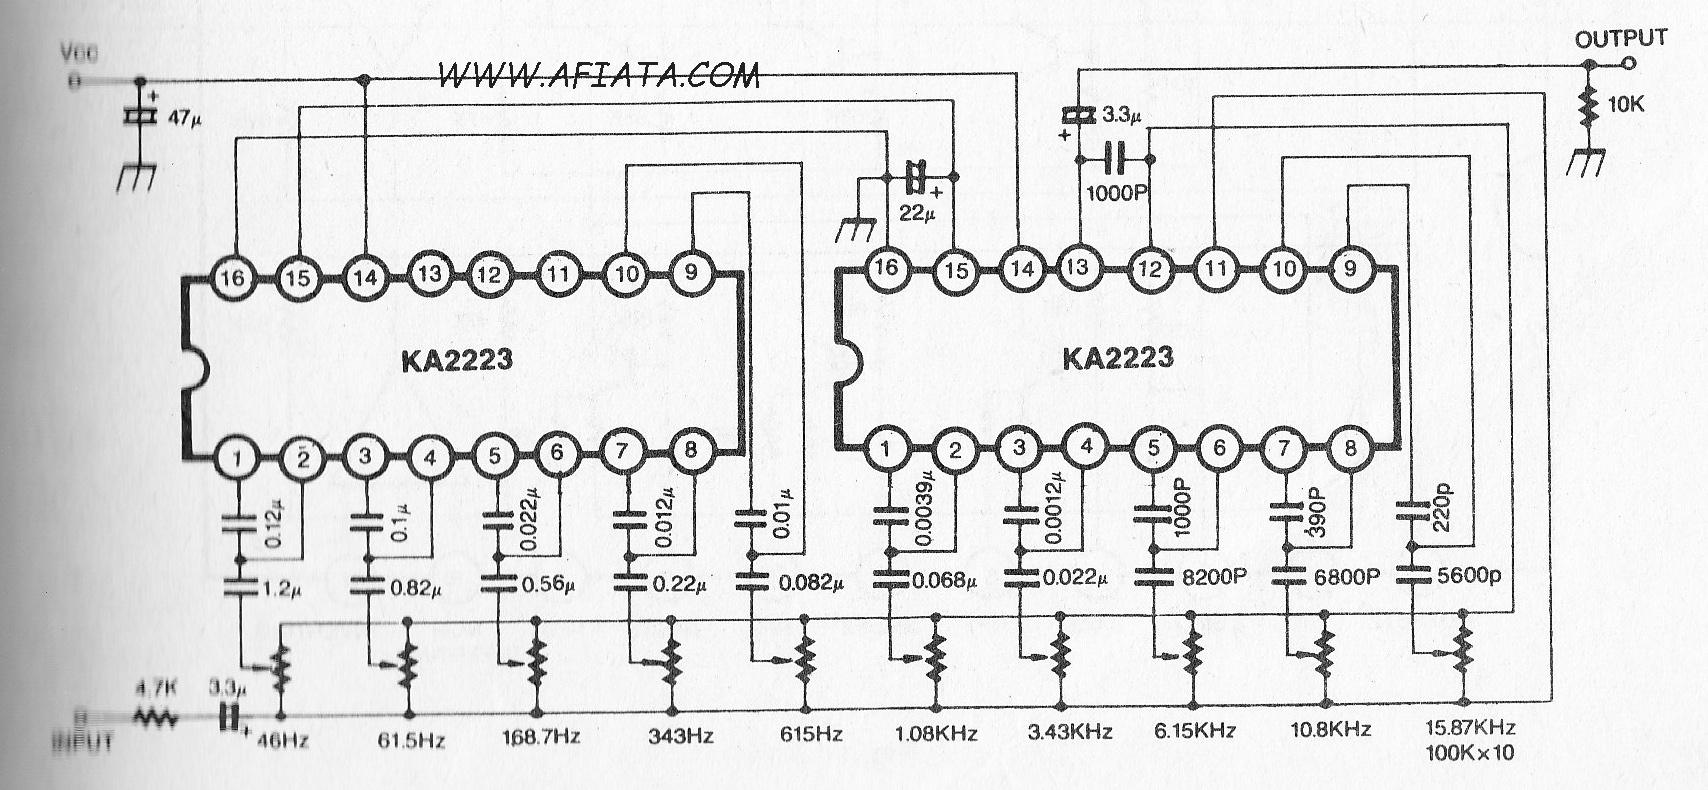 91 Geo Tracker Stereo Wiring Diagram 1994 Geo Metro Fuse